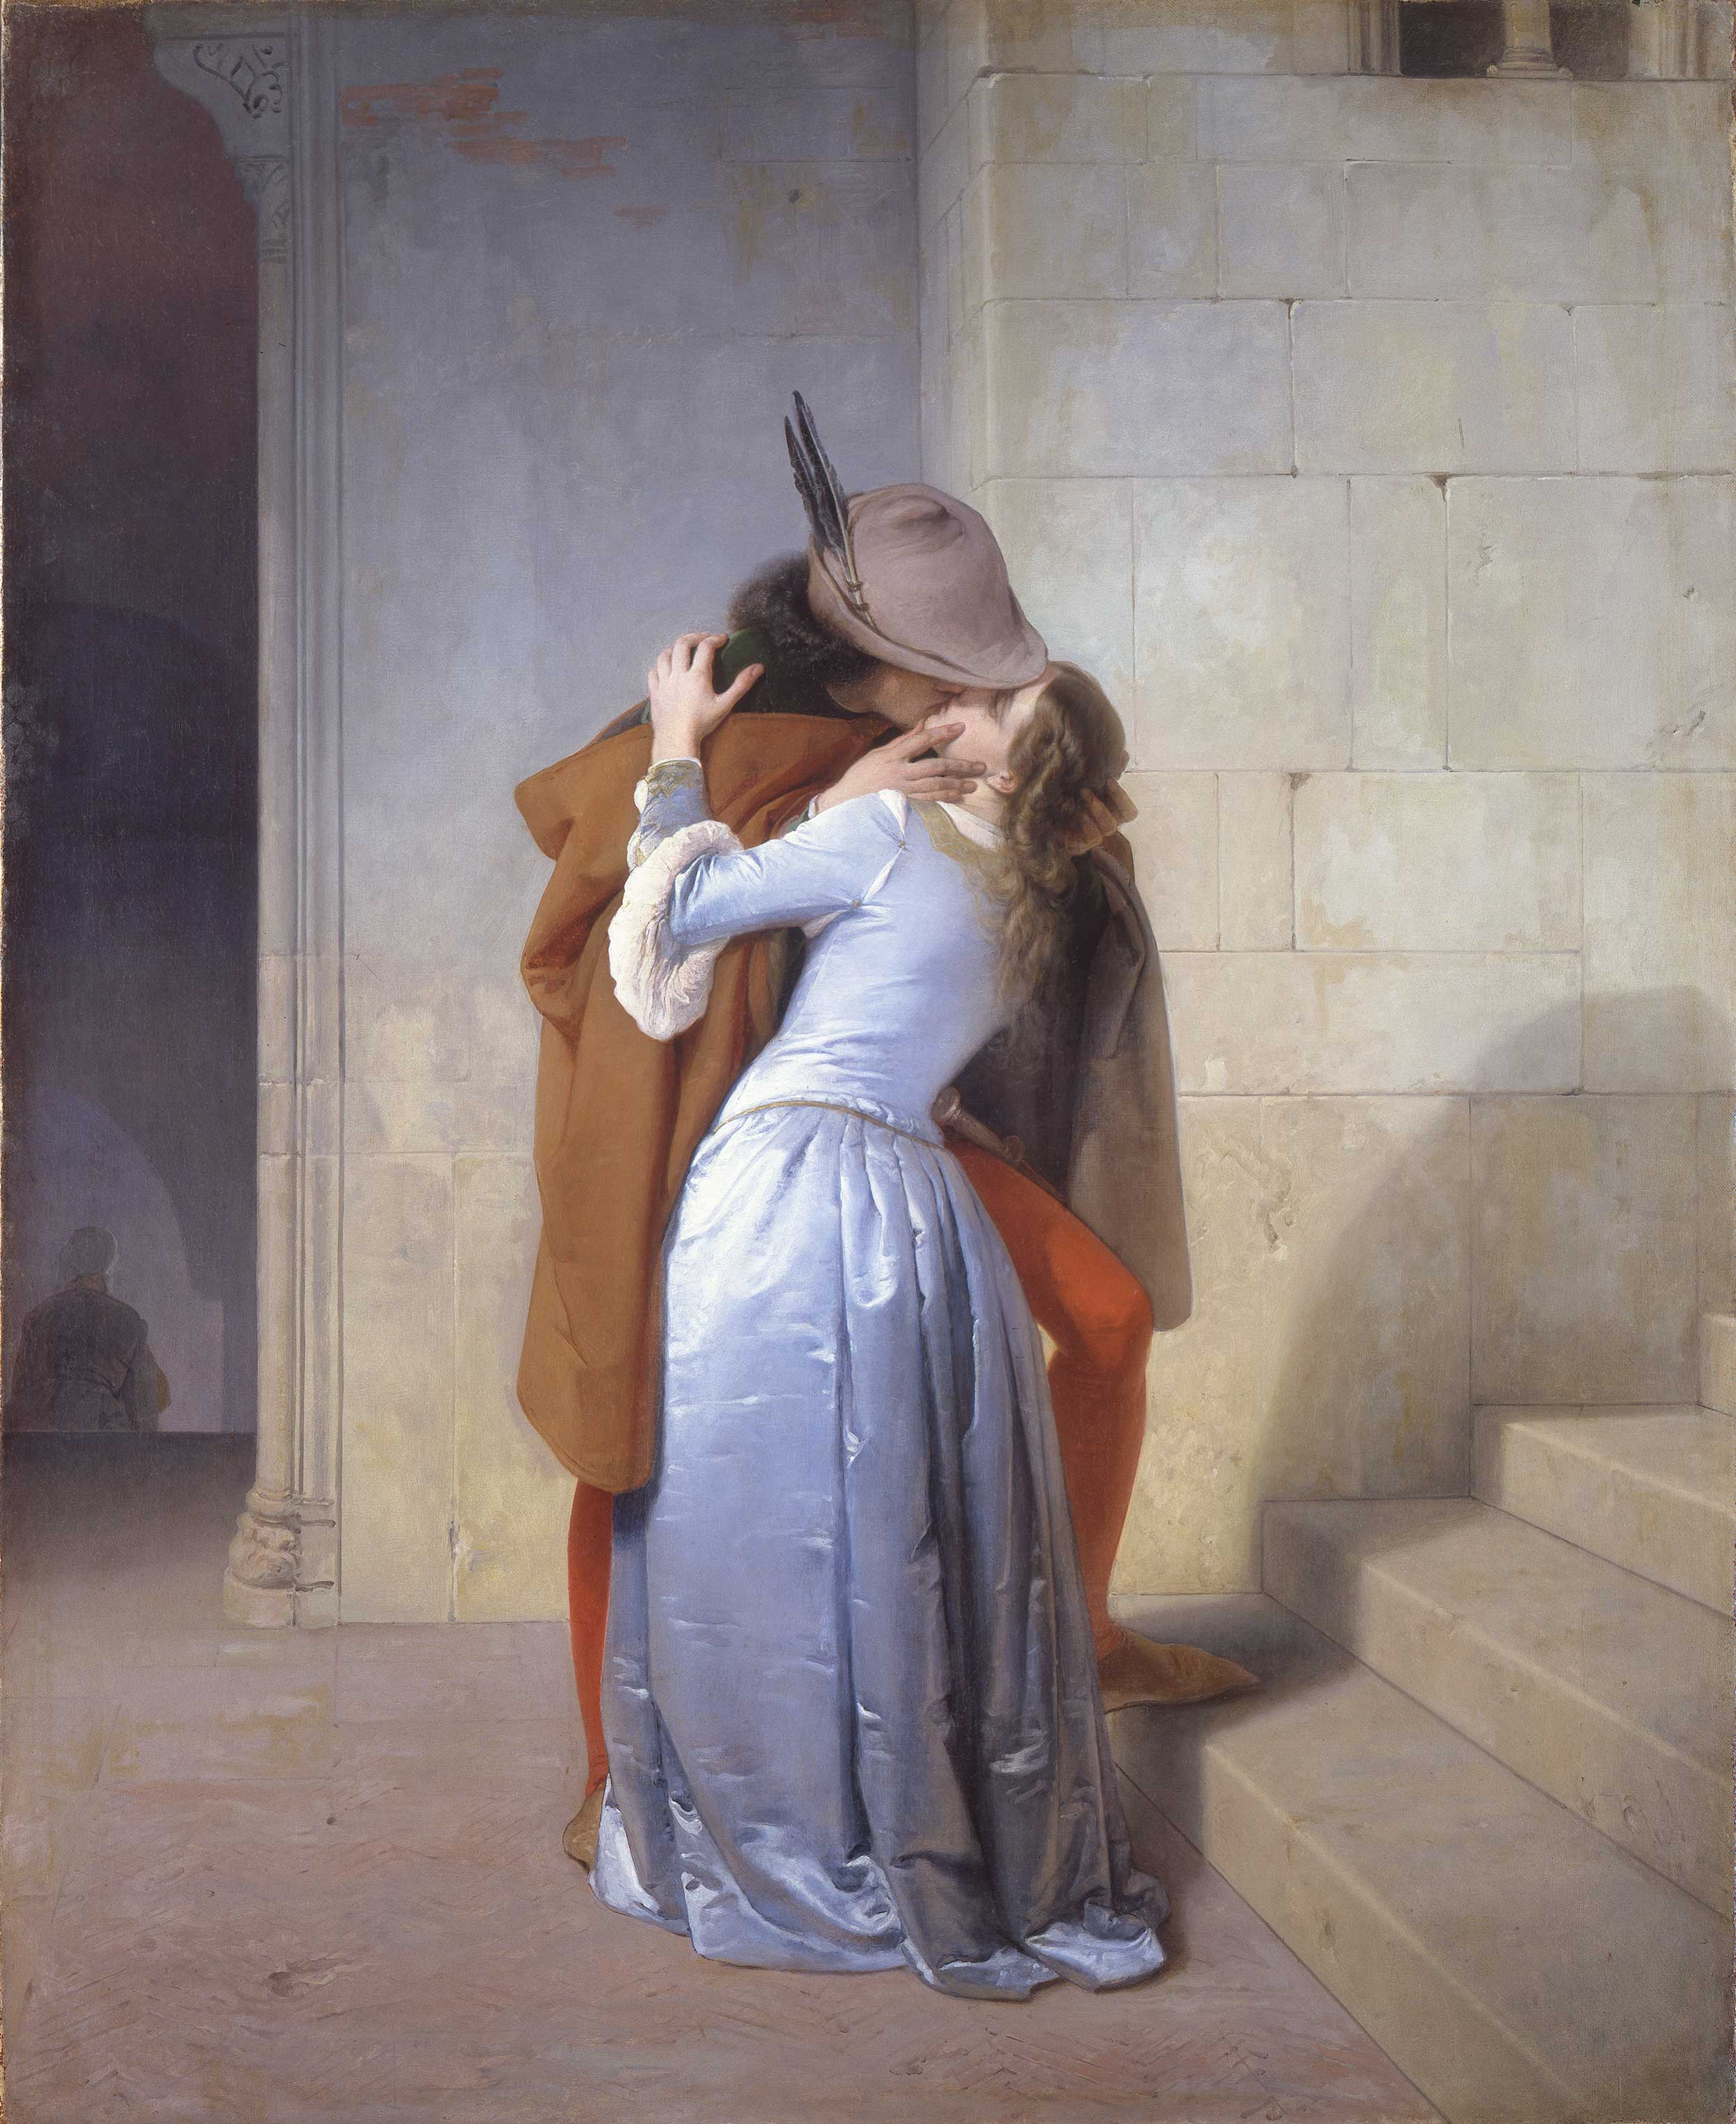 Il bacio, Francesco Hayez